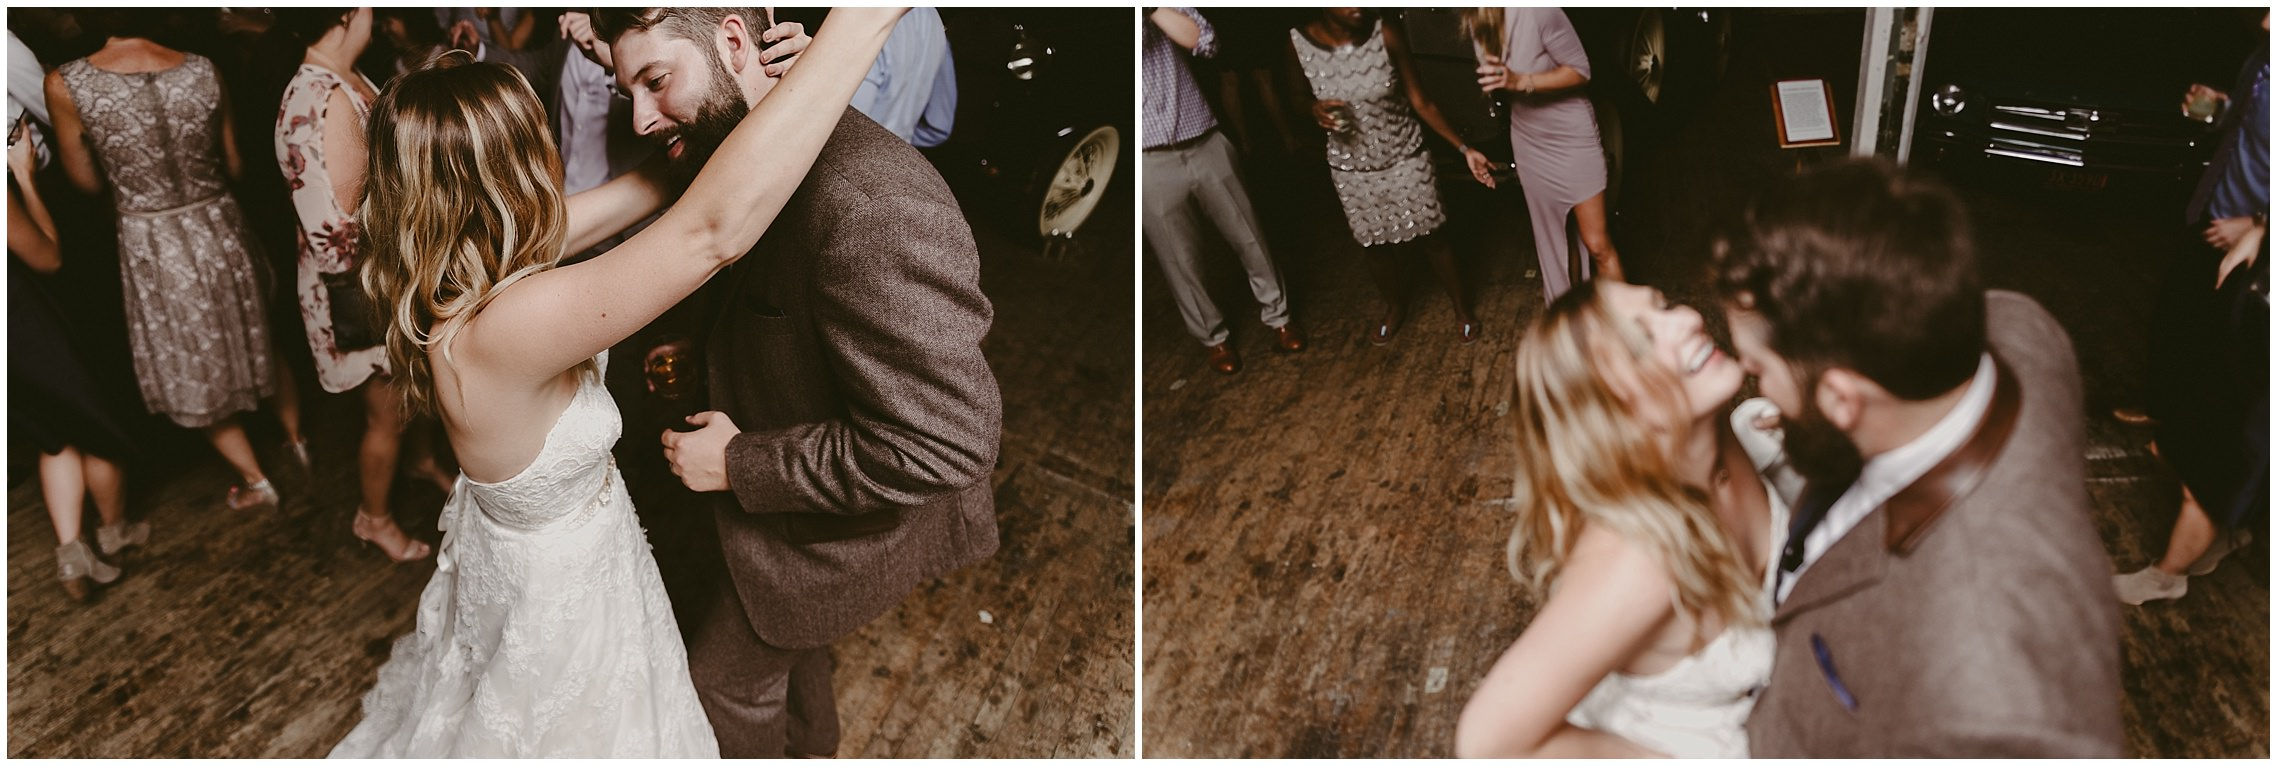 brick_and_mortar_colorado_wedding_photographer_0266.jpg